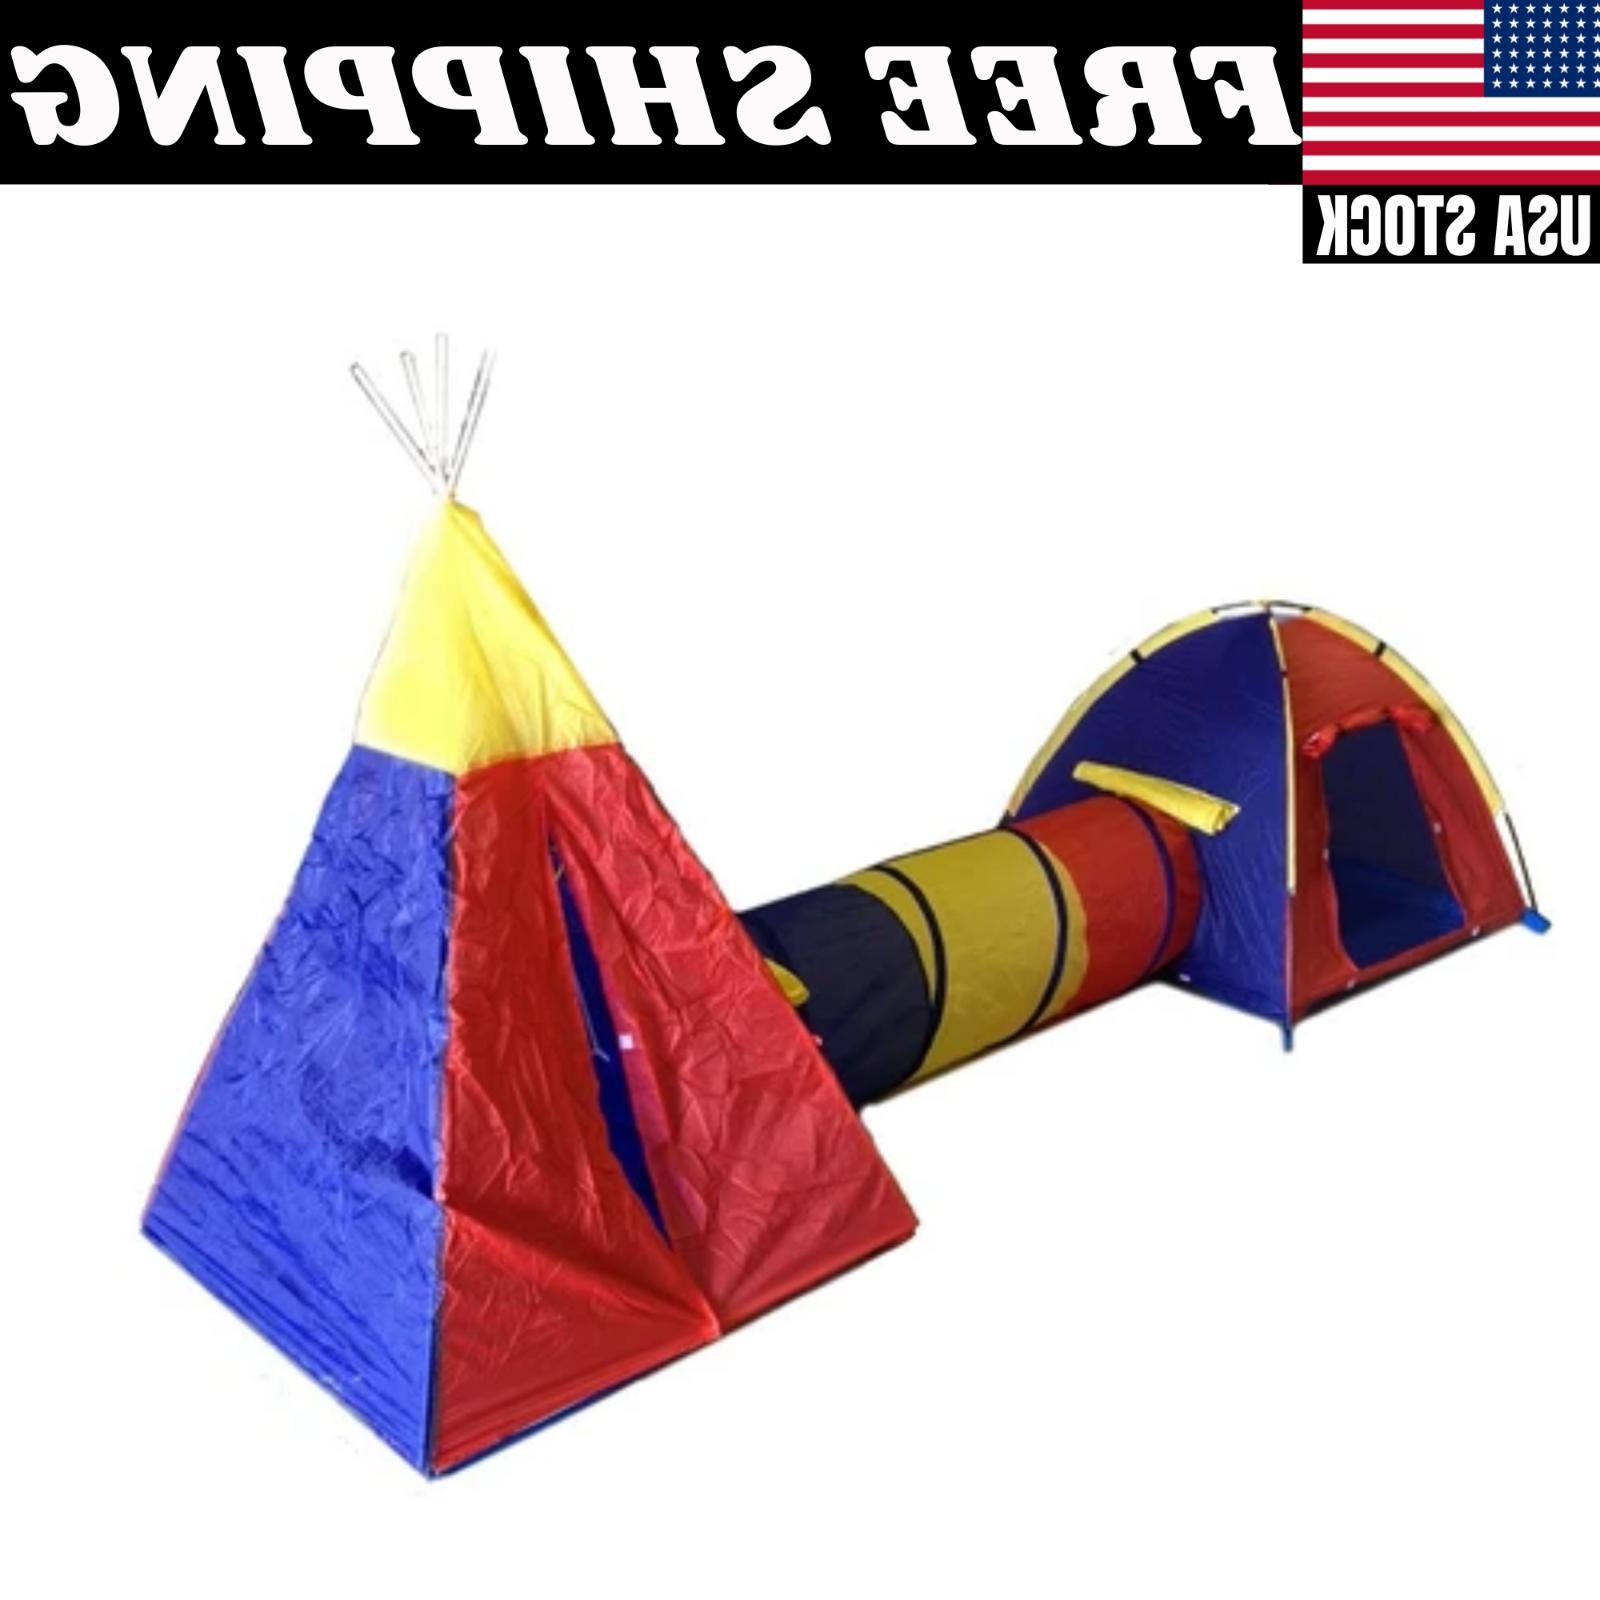 Children's Play Tent Set - 2 Rooms Tunnels Fun Playhouse Cas